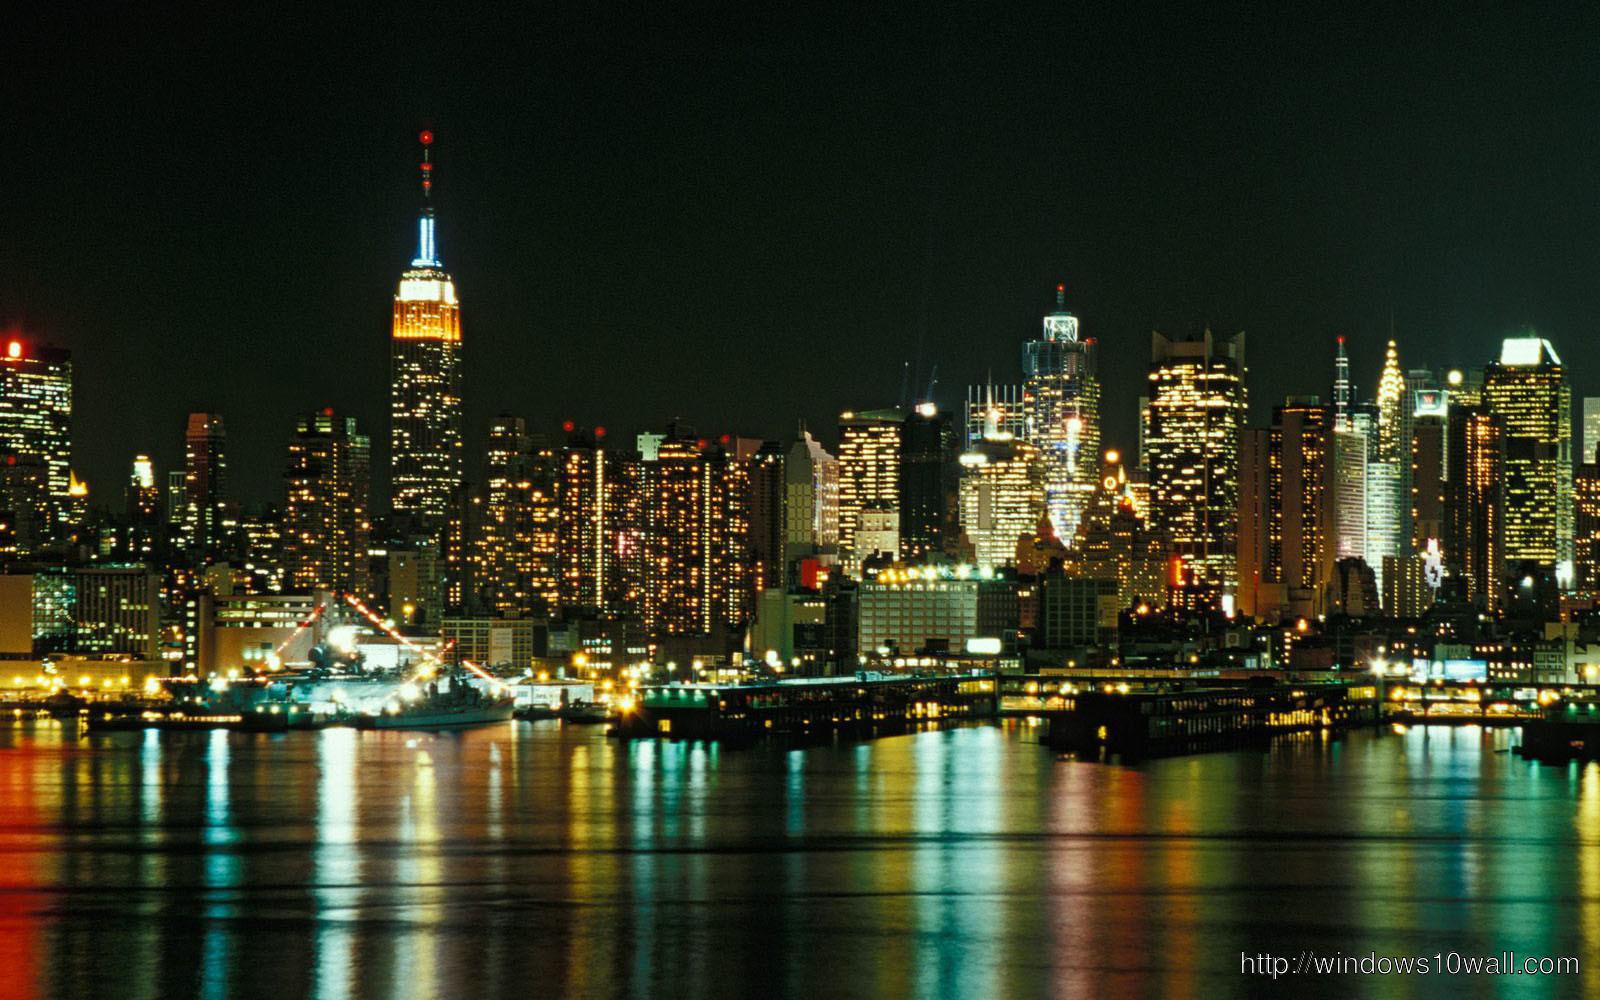 New York City Hd Free Wallpaper Windows 10 Wallpapers